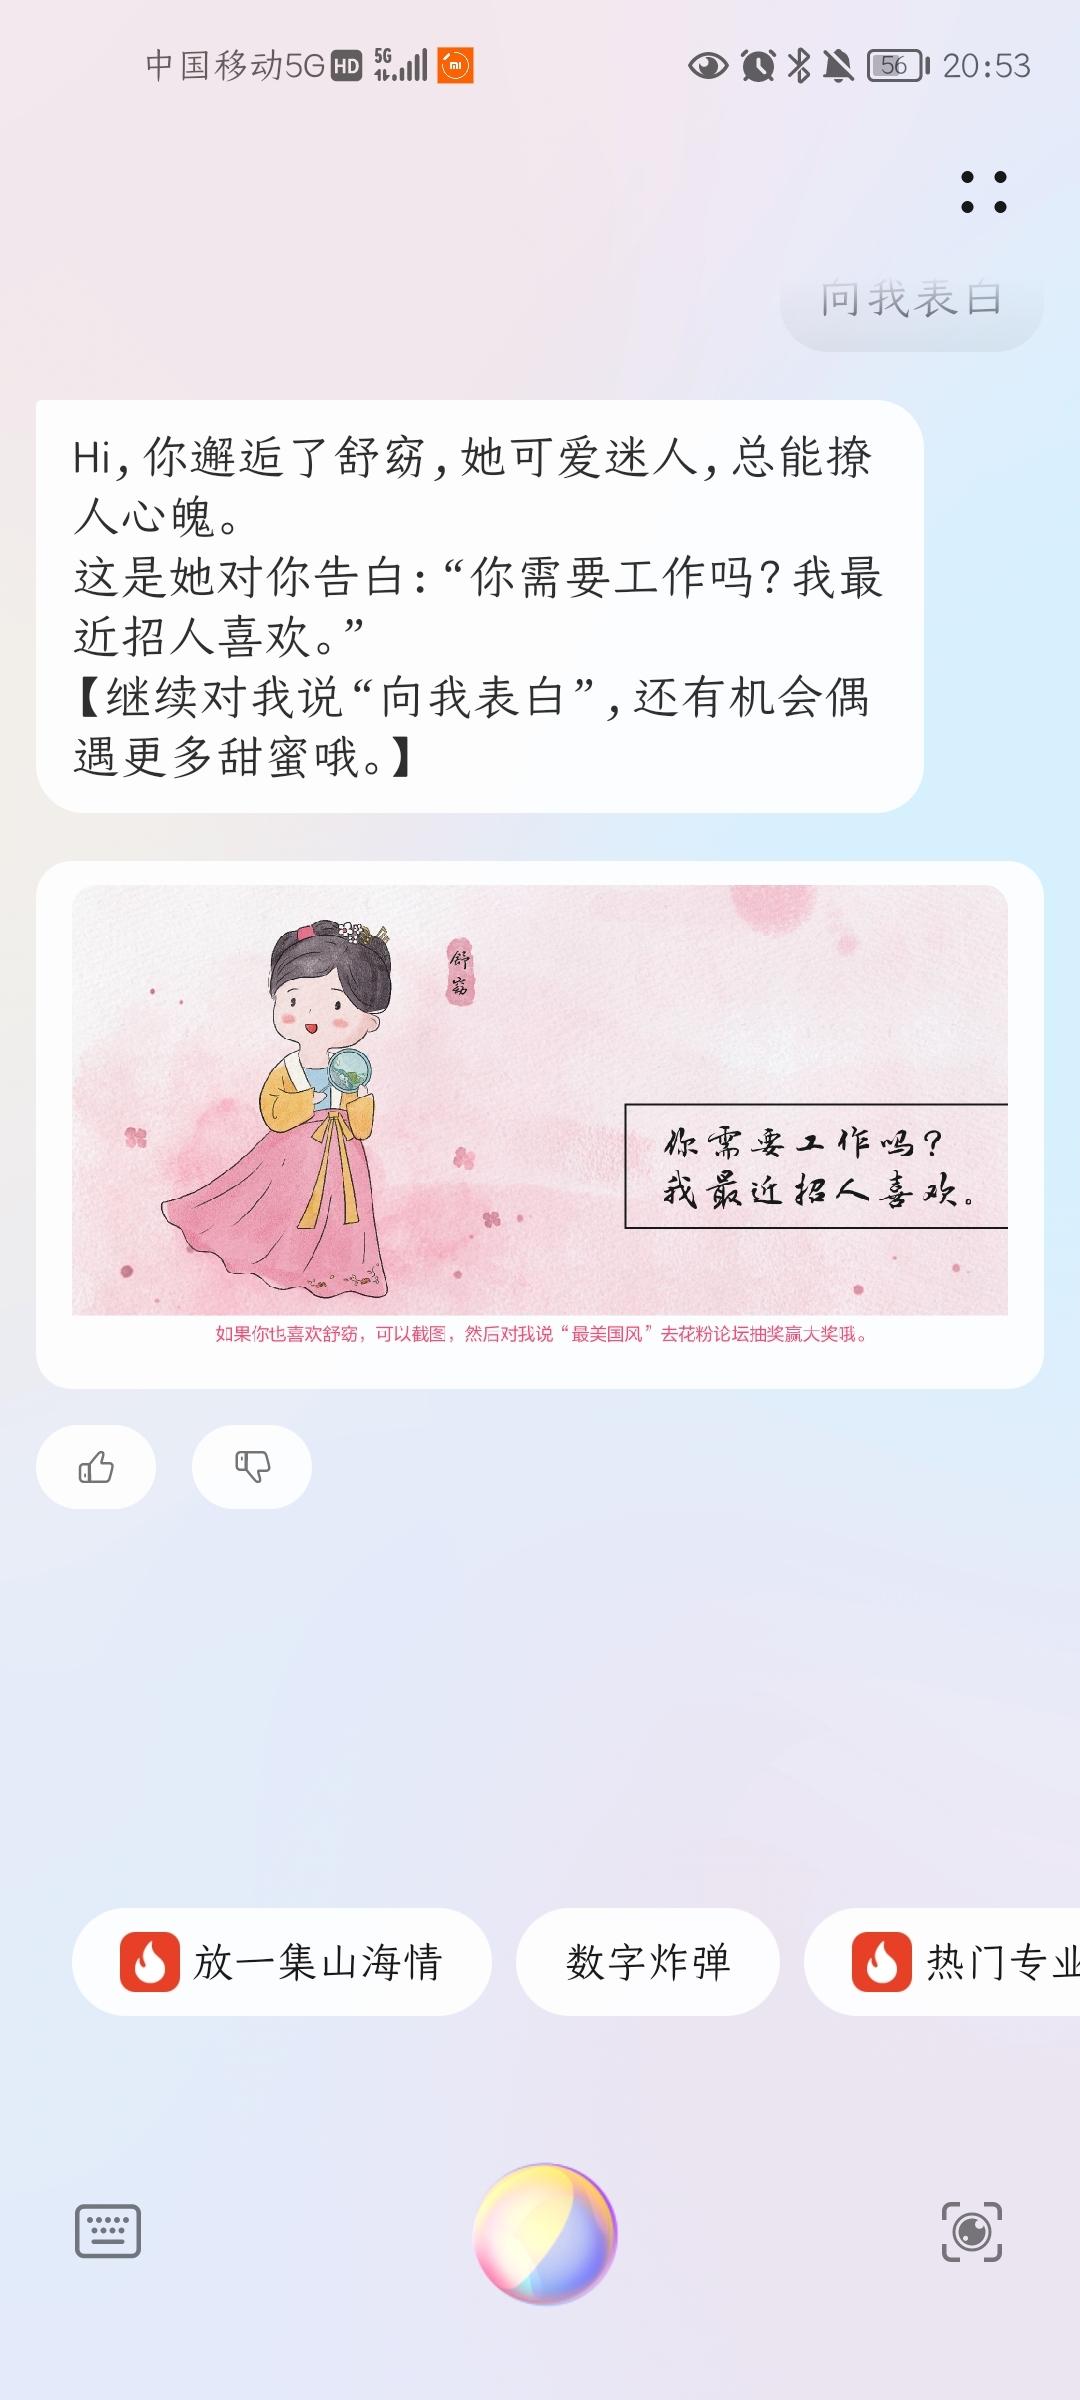 Screenshot_20210611_205345_com.huawei.vassistant.jpg